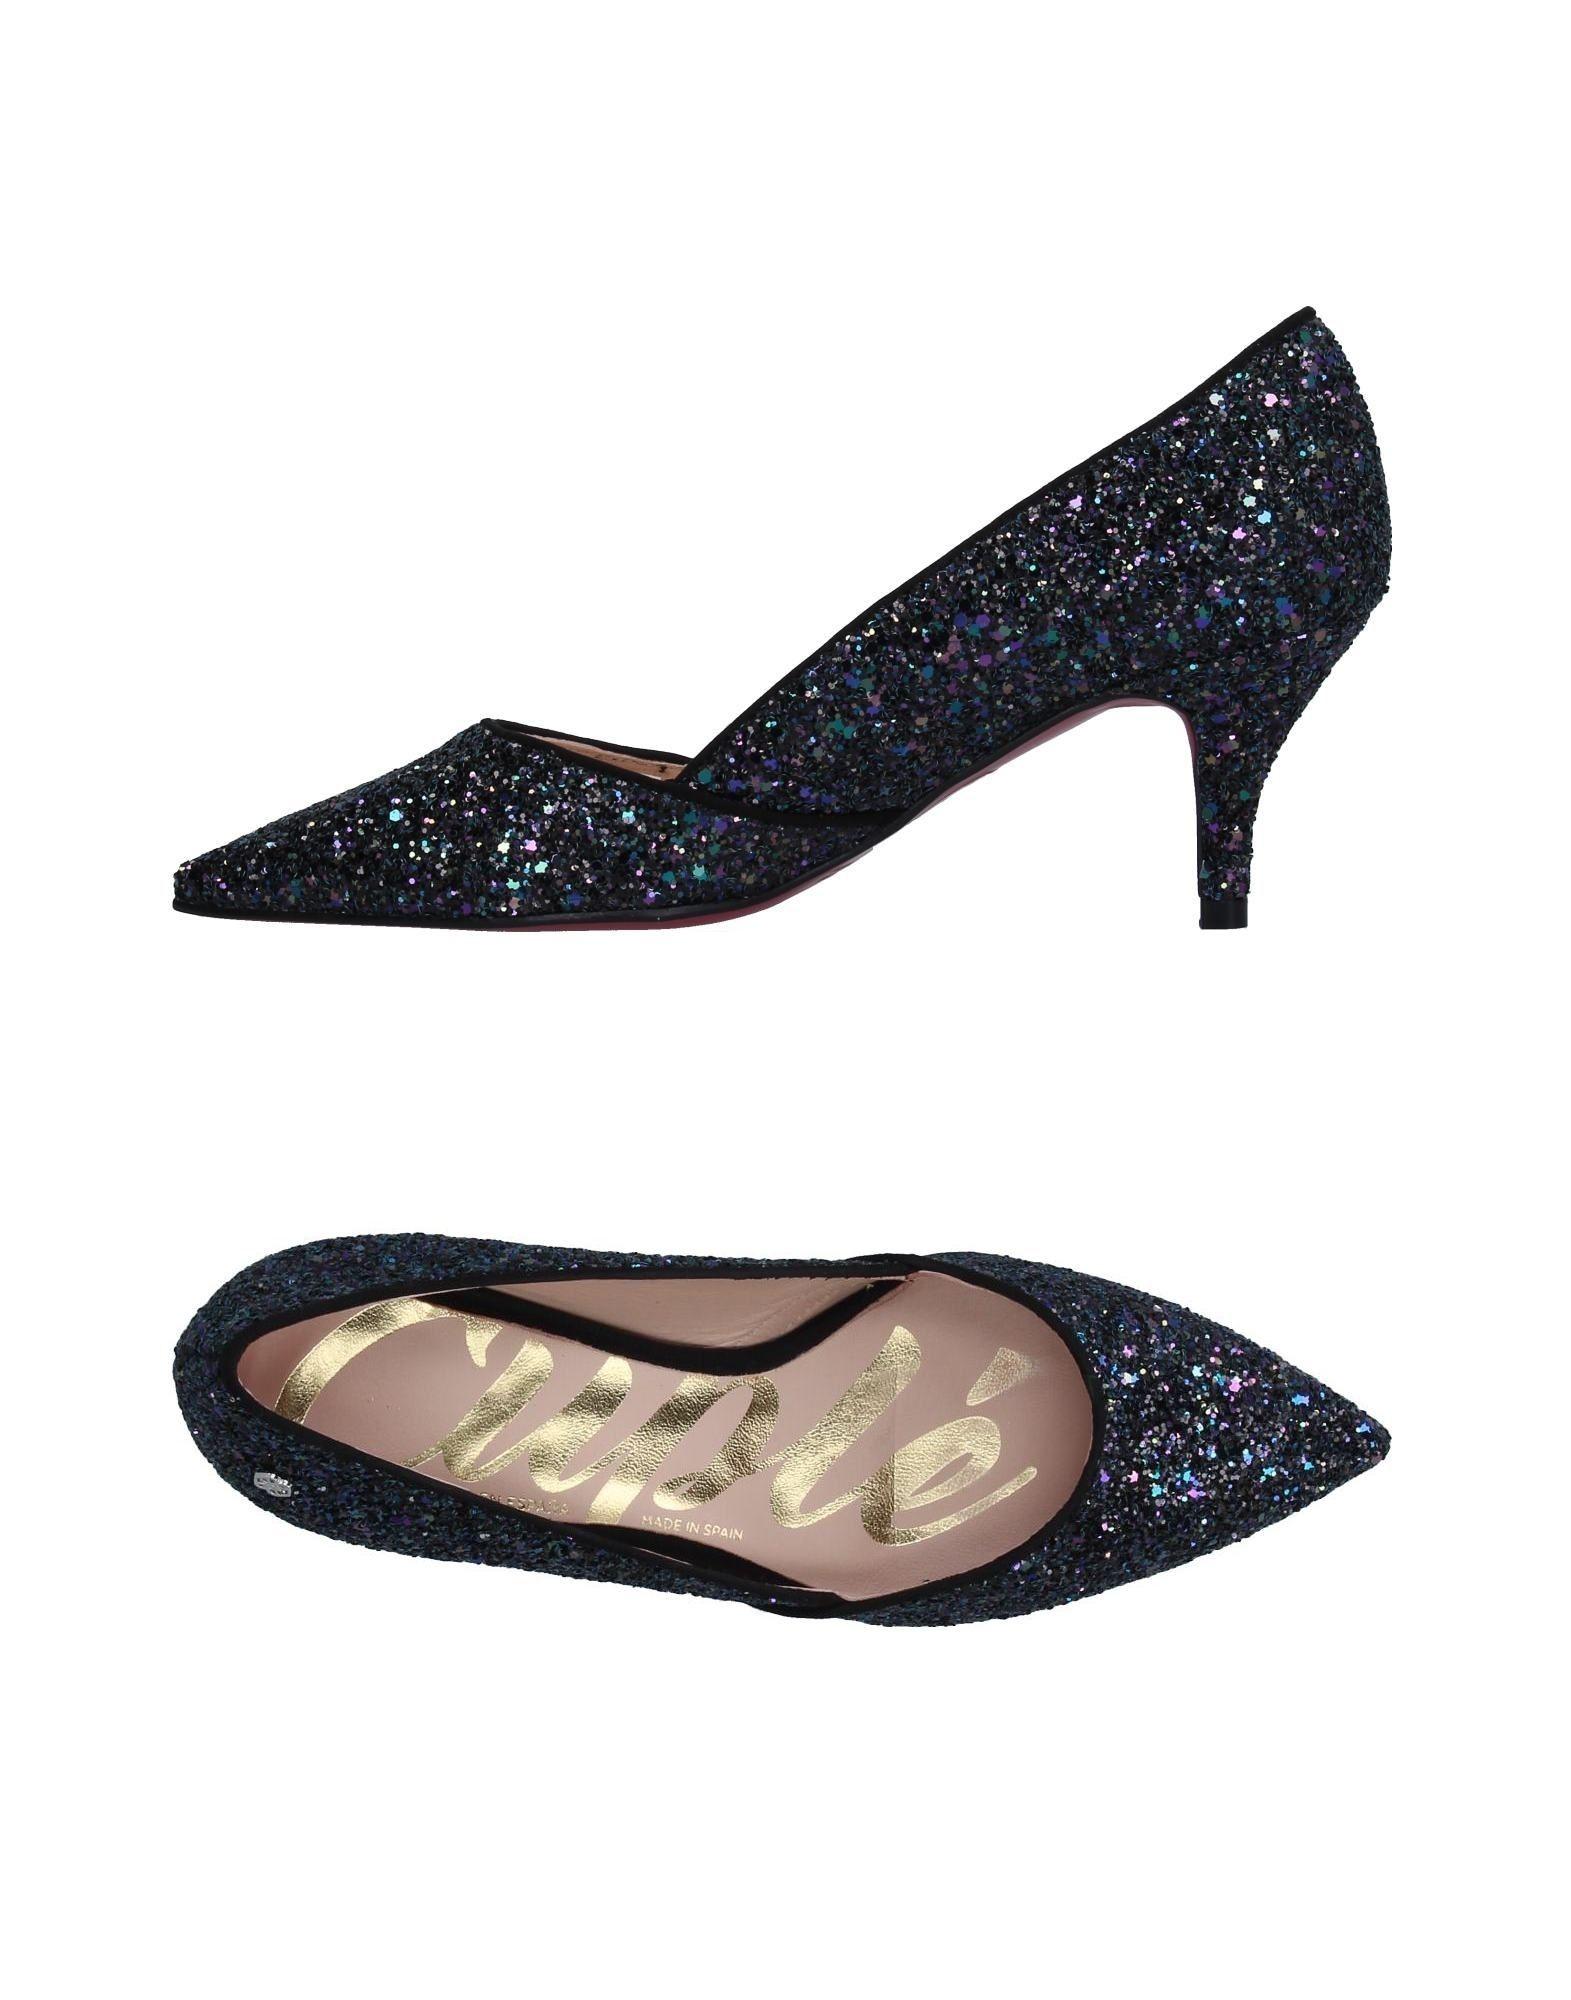 Cuplé 11338791LH Pumps Damen  11338791LH Cuplé Gute Qualität beliebte Schuhe 71247b